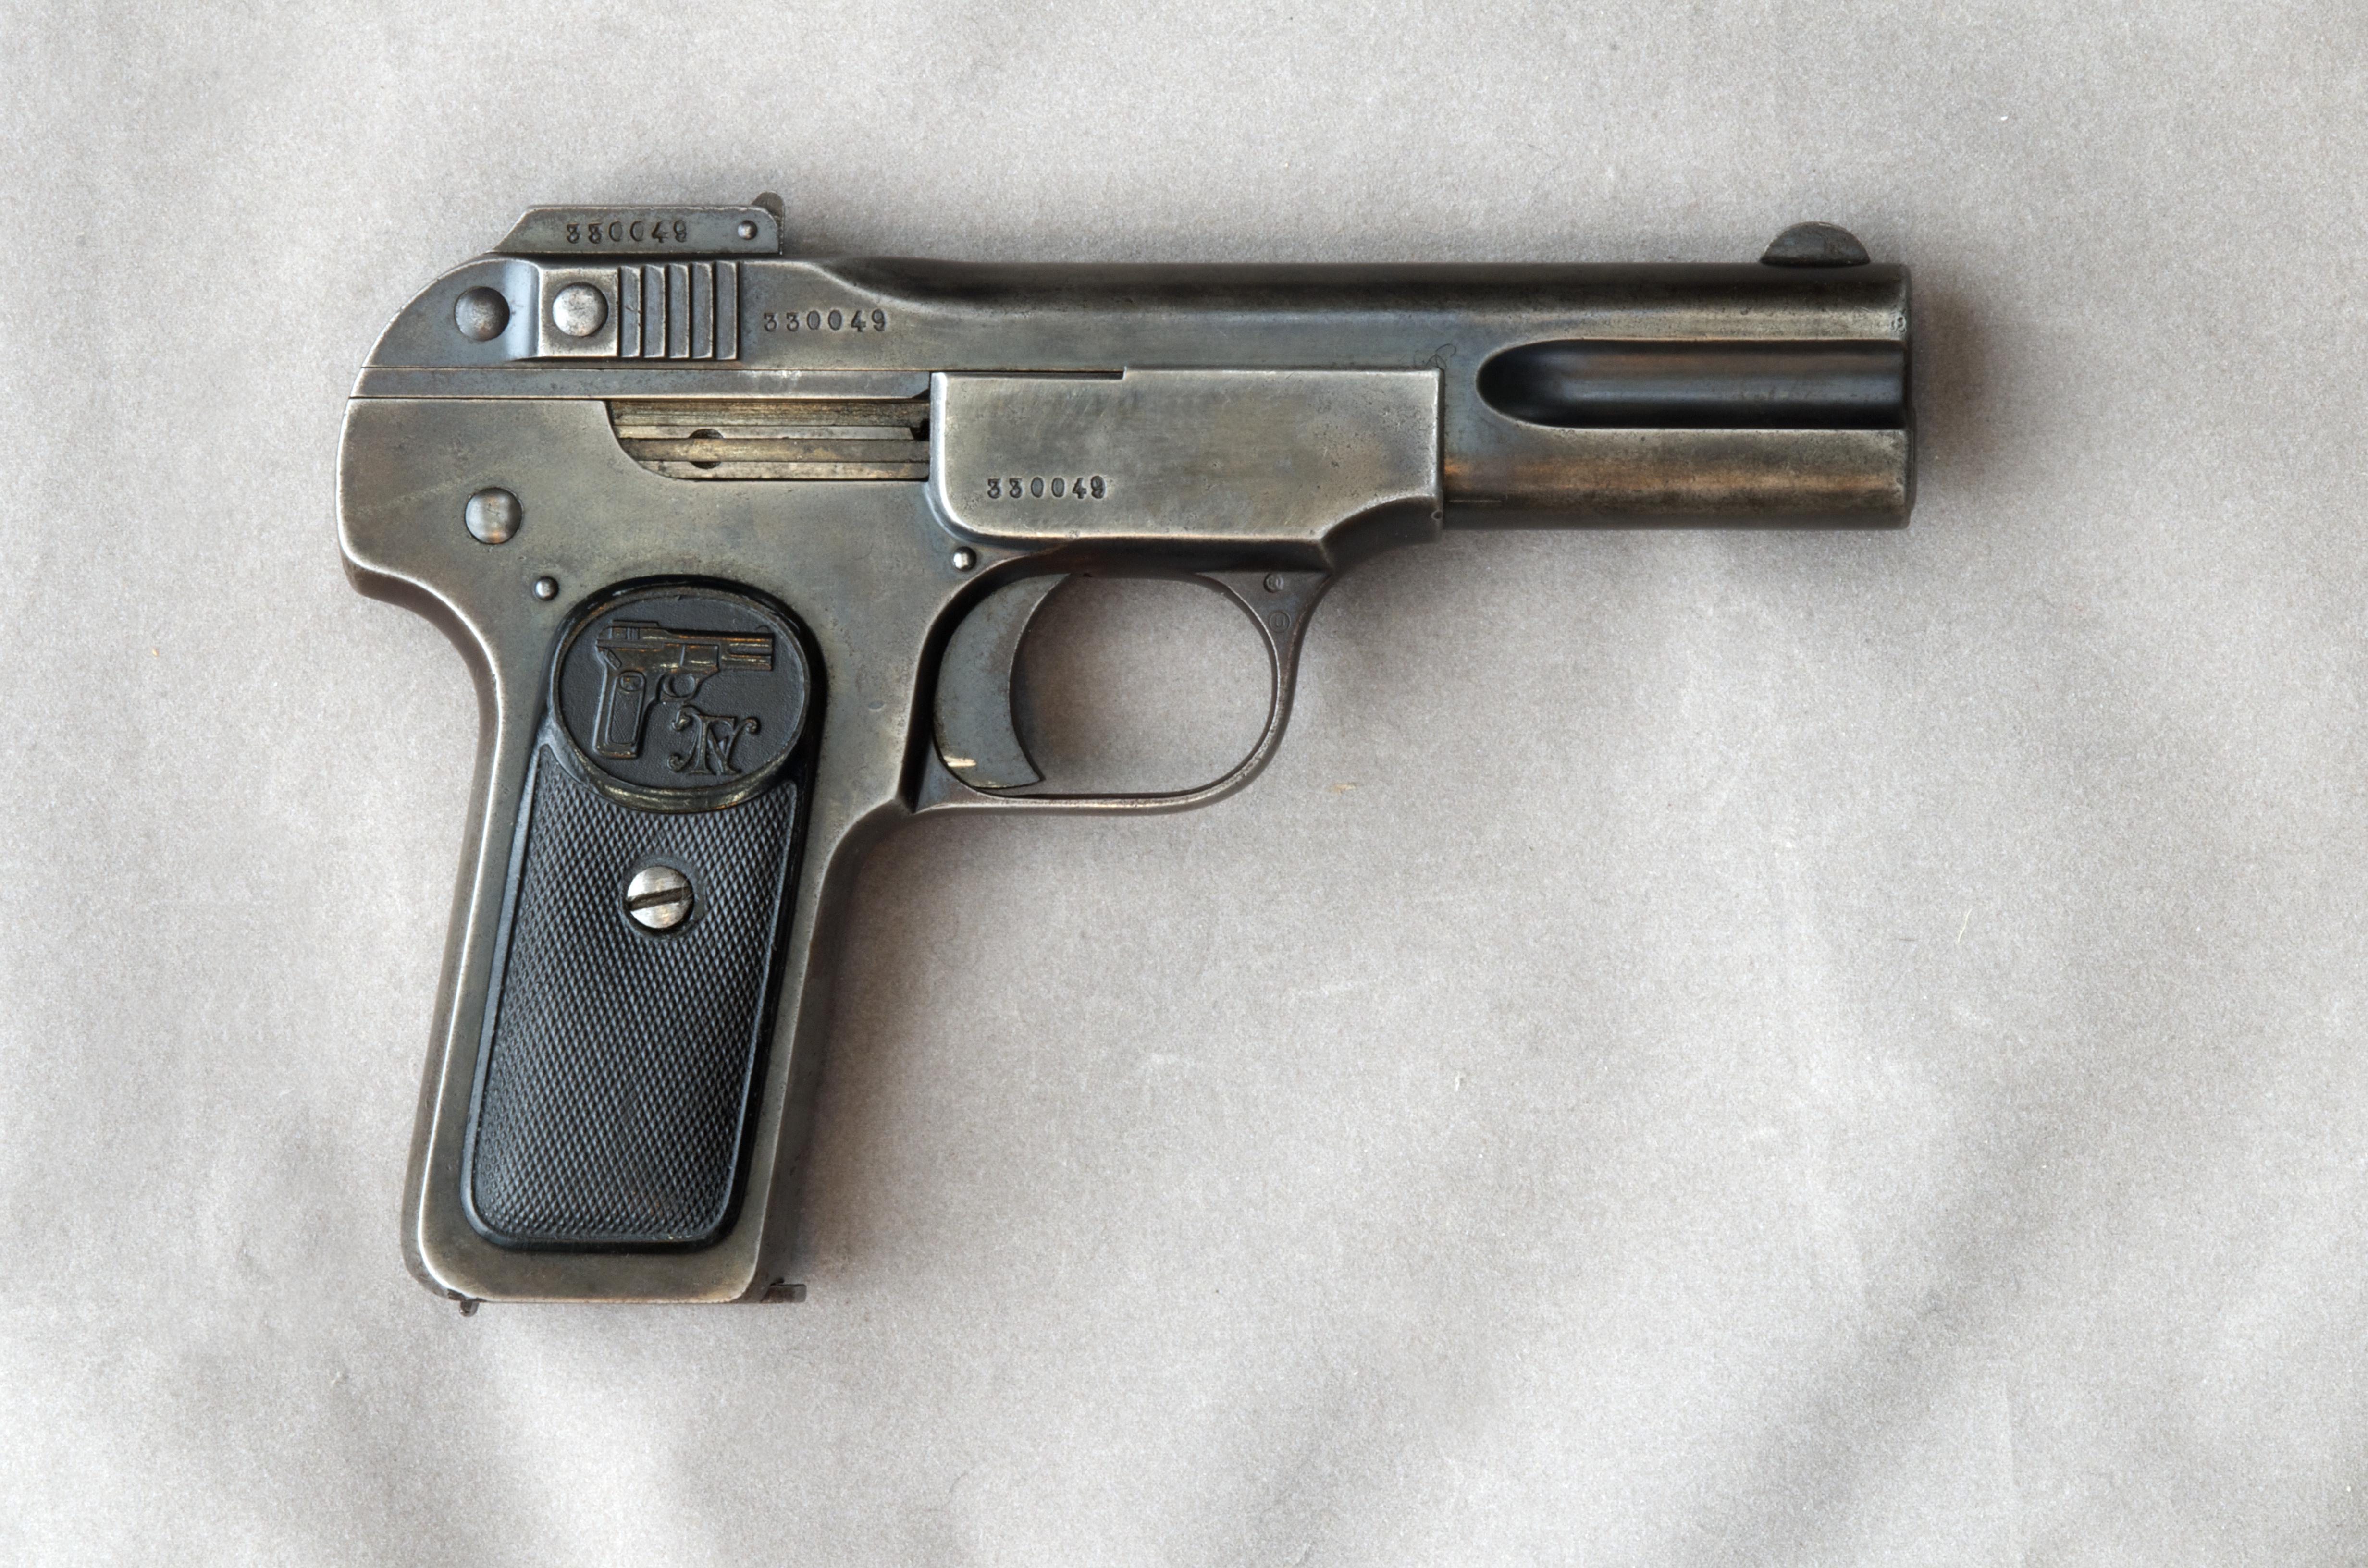 FN M1900 - Wikipedia